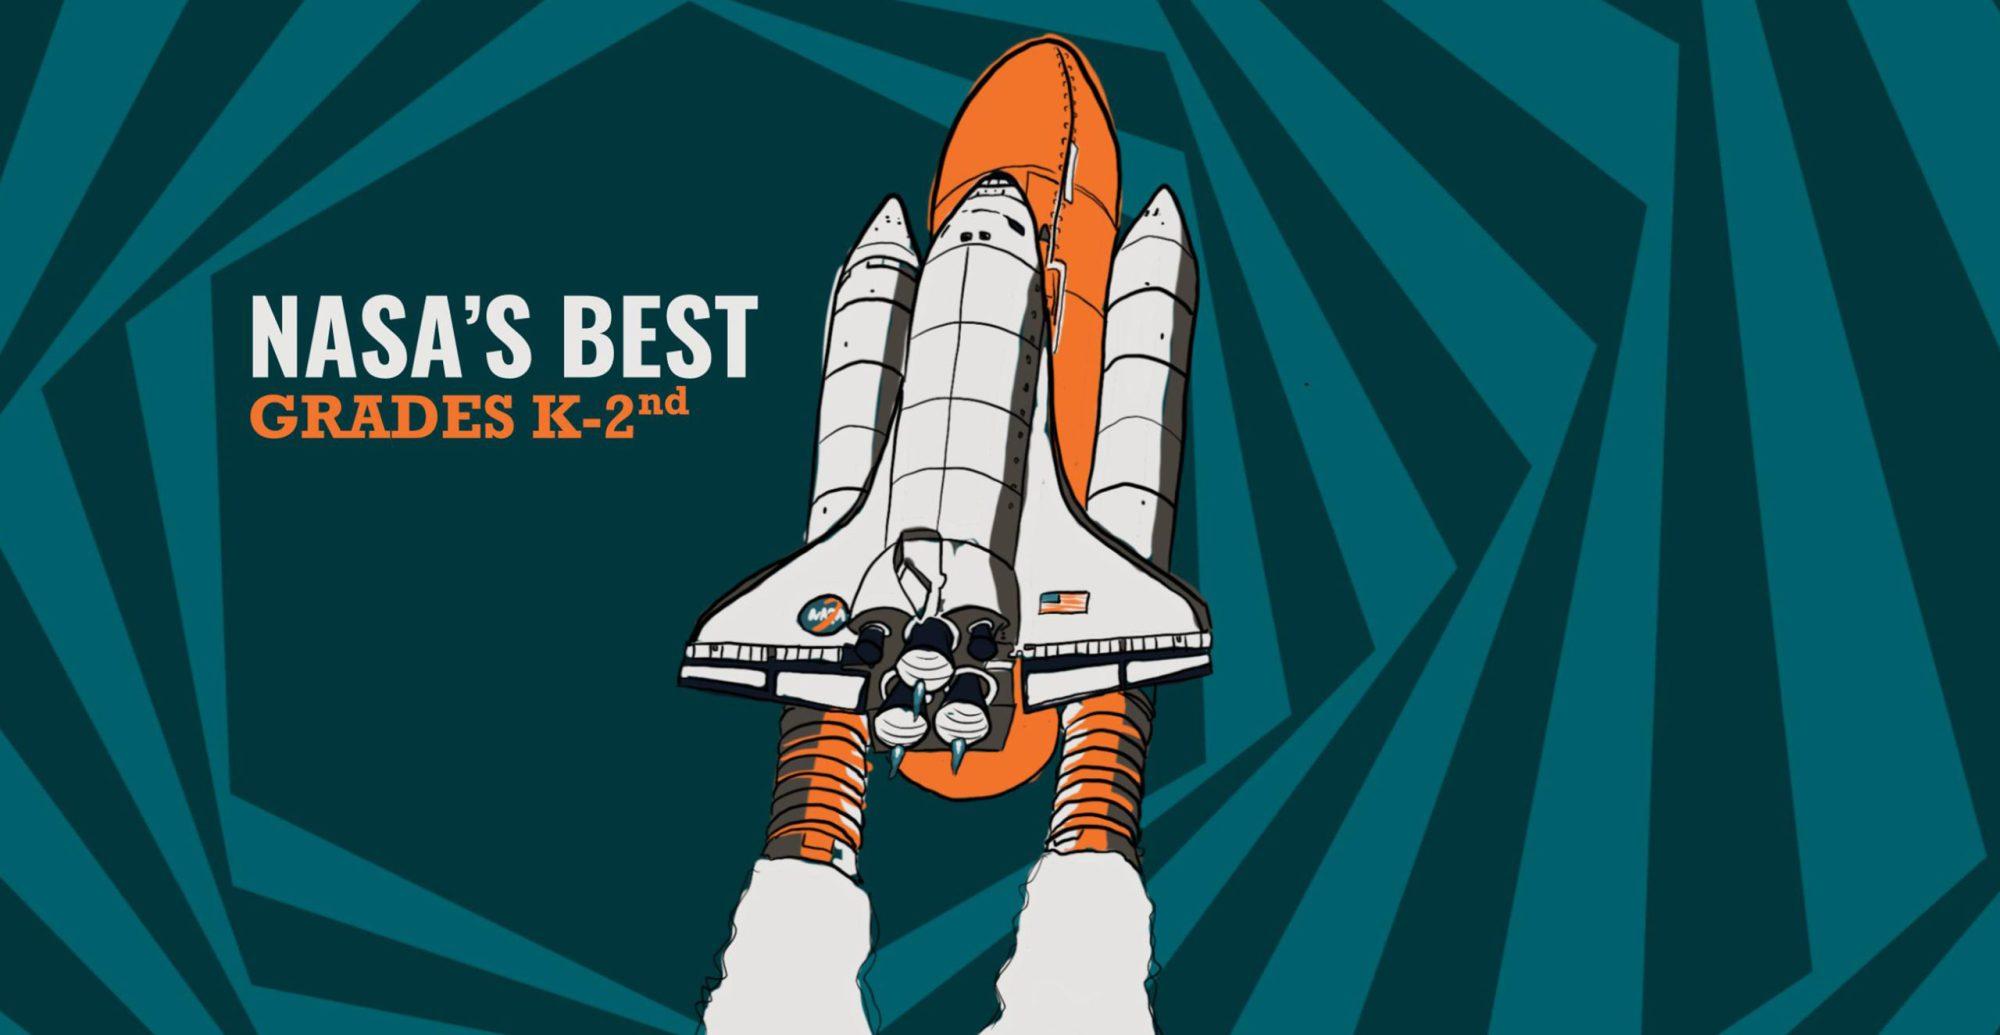 hight resolution of NASA's BEST Students: K - Grade 2 - Annenberg Learner